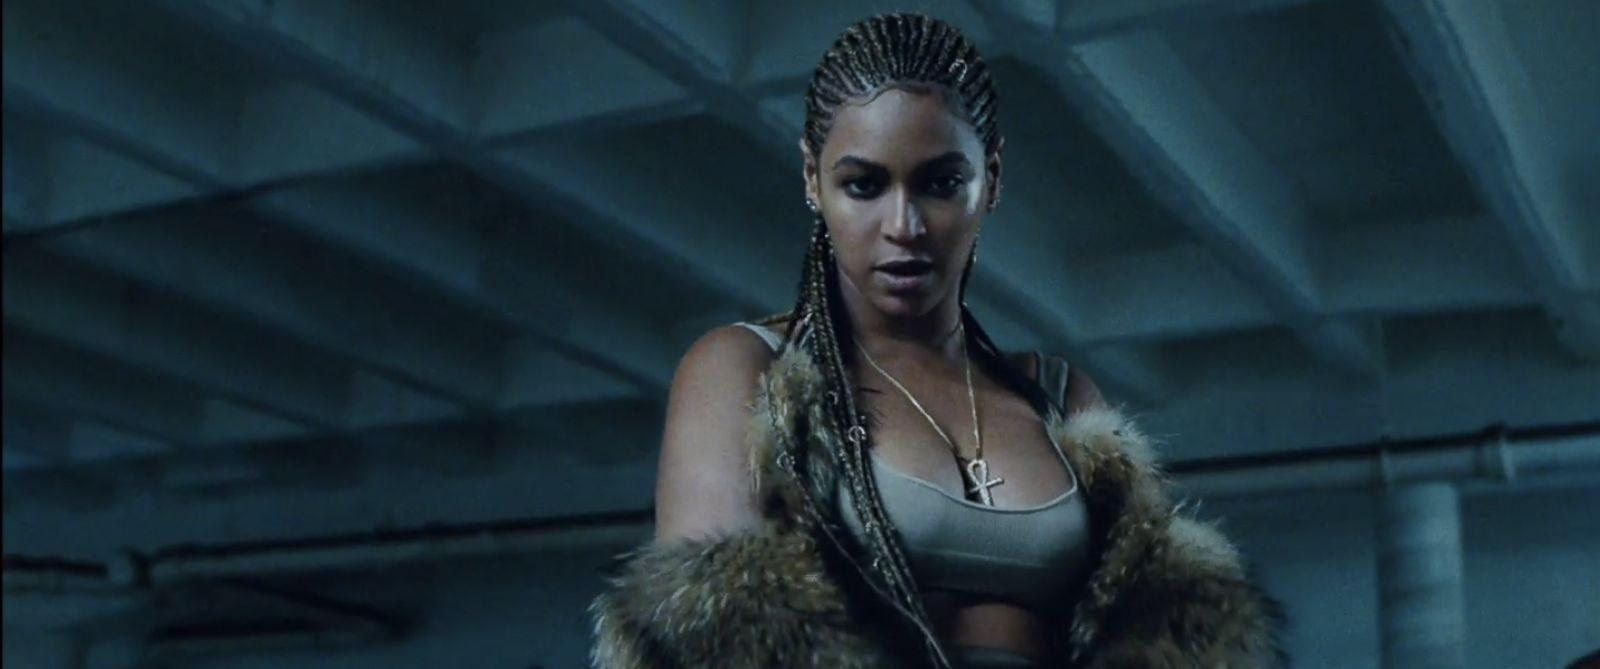 Beyonce illuminati is beyonce in the illuminati the truth beyonce ankh sekhemet lemonade buycottarizona Gallery